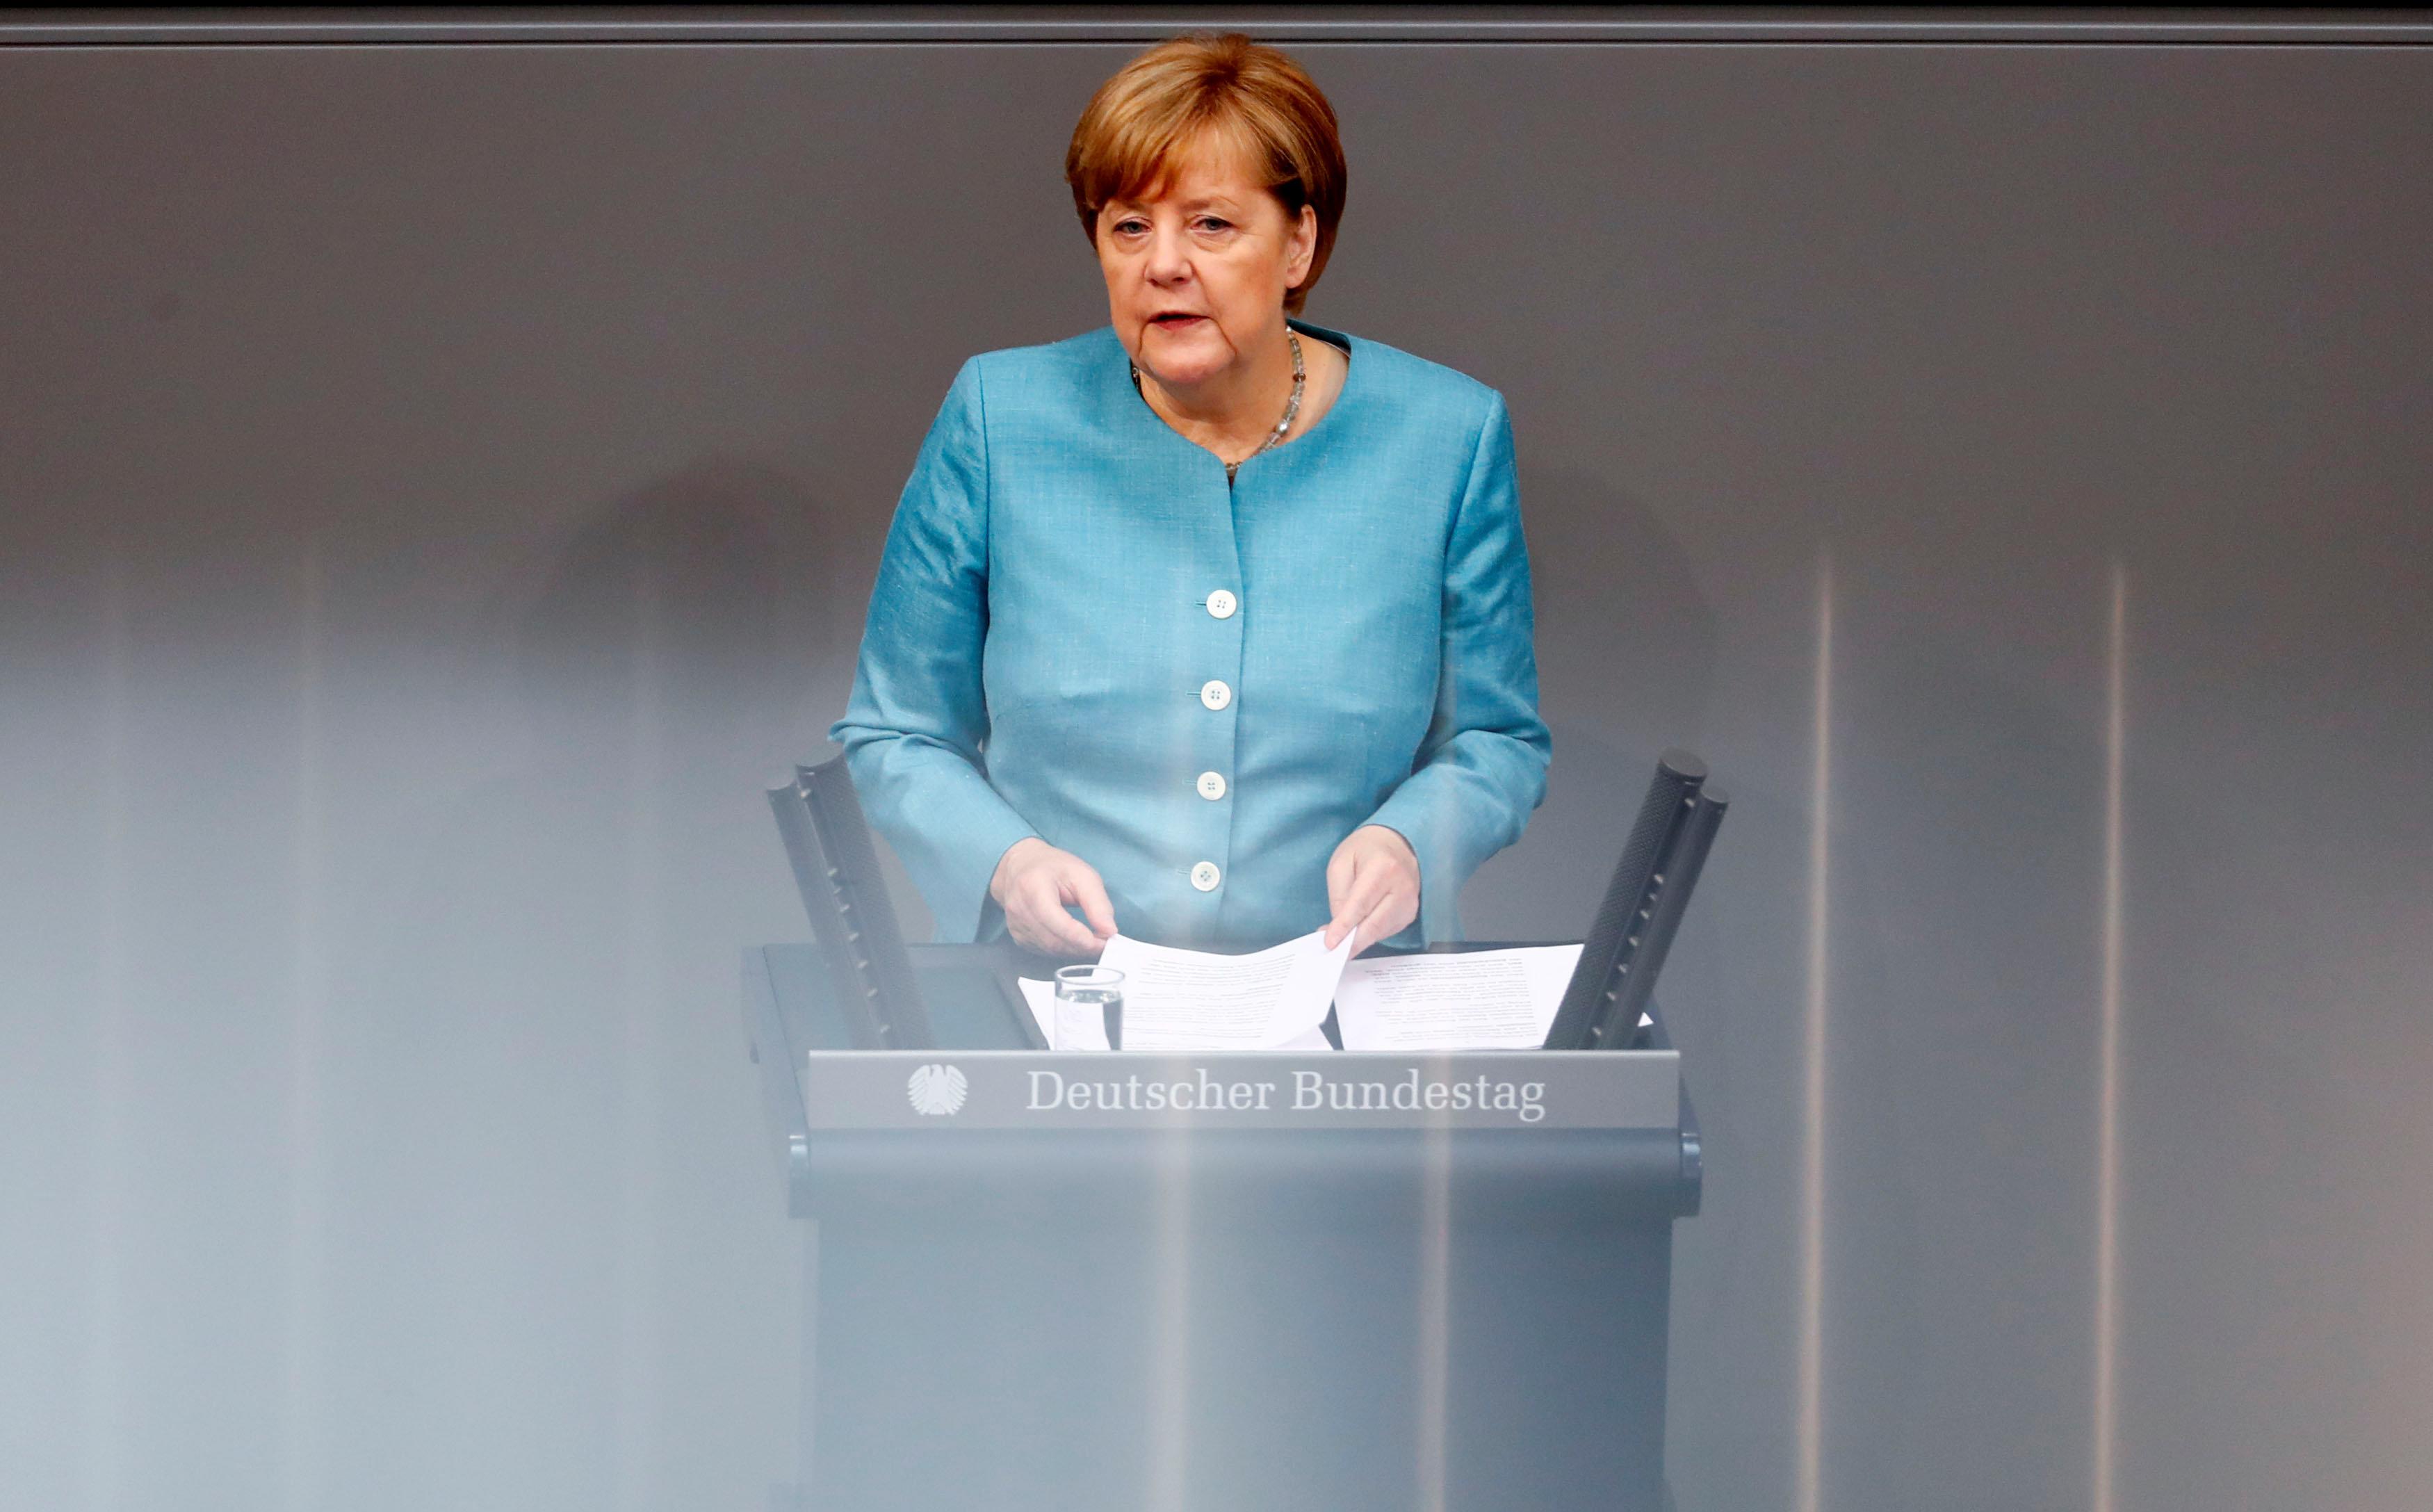 German Chancellor Angela Merkel addresses the lower house of parliament.